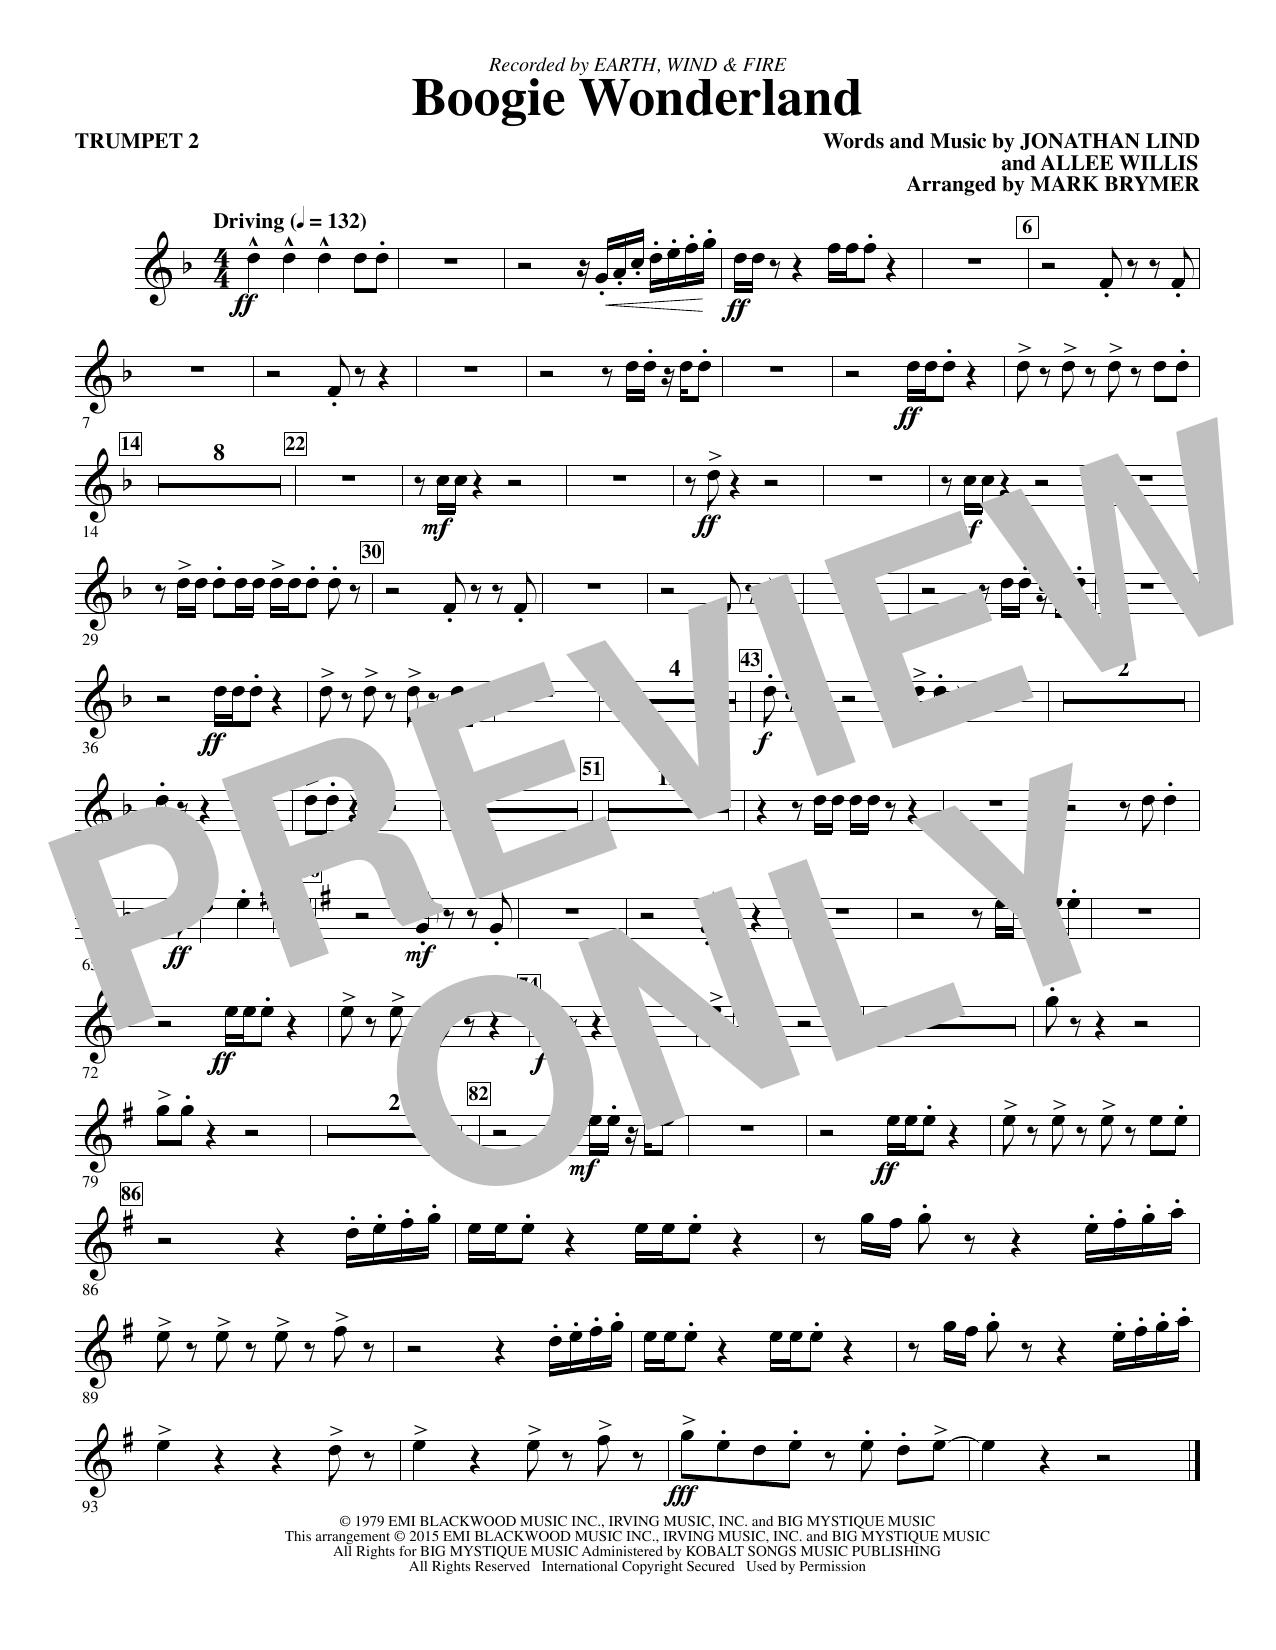 Boogie wonderland bb trumpet 2 sheet music by earth wind fire boogie wonderland bb trumpet 2 sheet music ccuart Choice Image